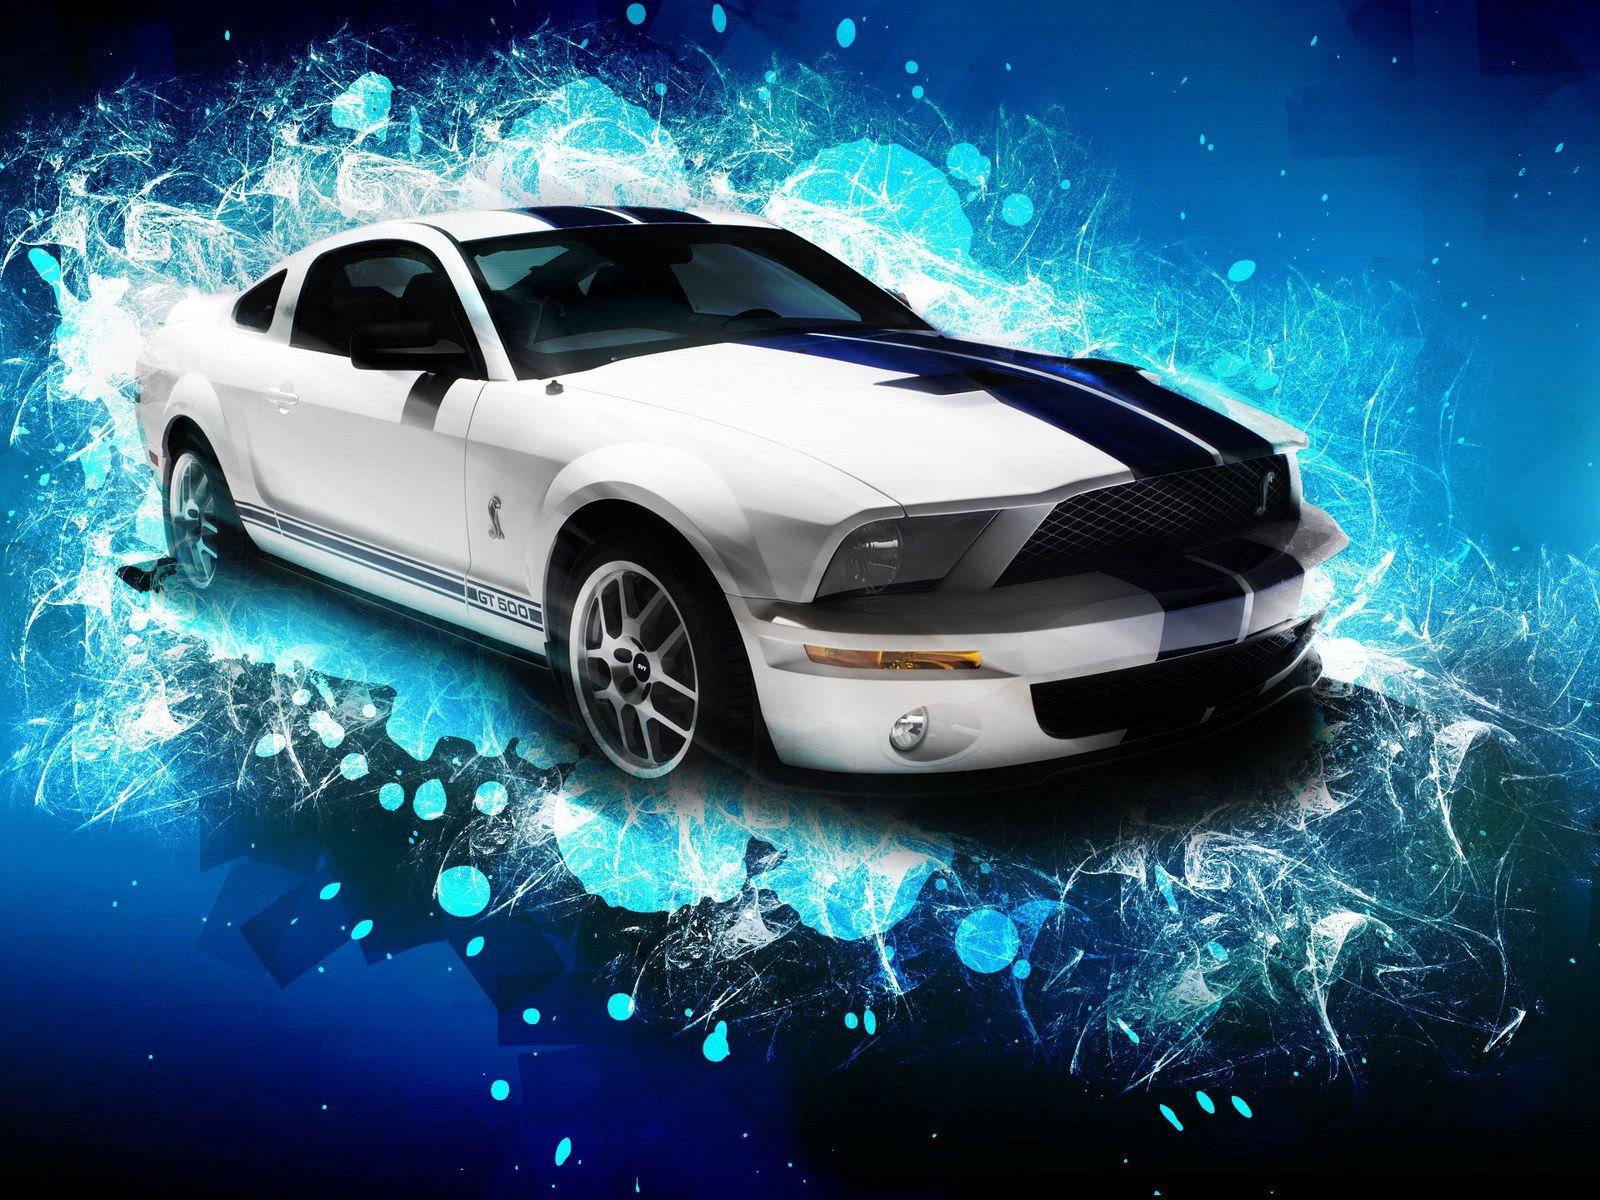 Future Ride Ford Mustang Gt500 Mustang Wallpaper Sports Car Wallpaper